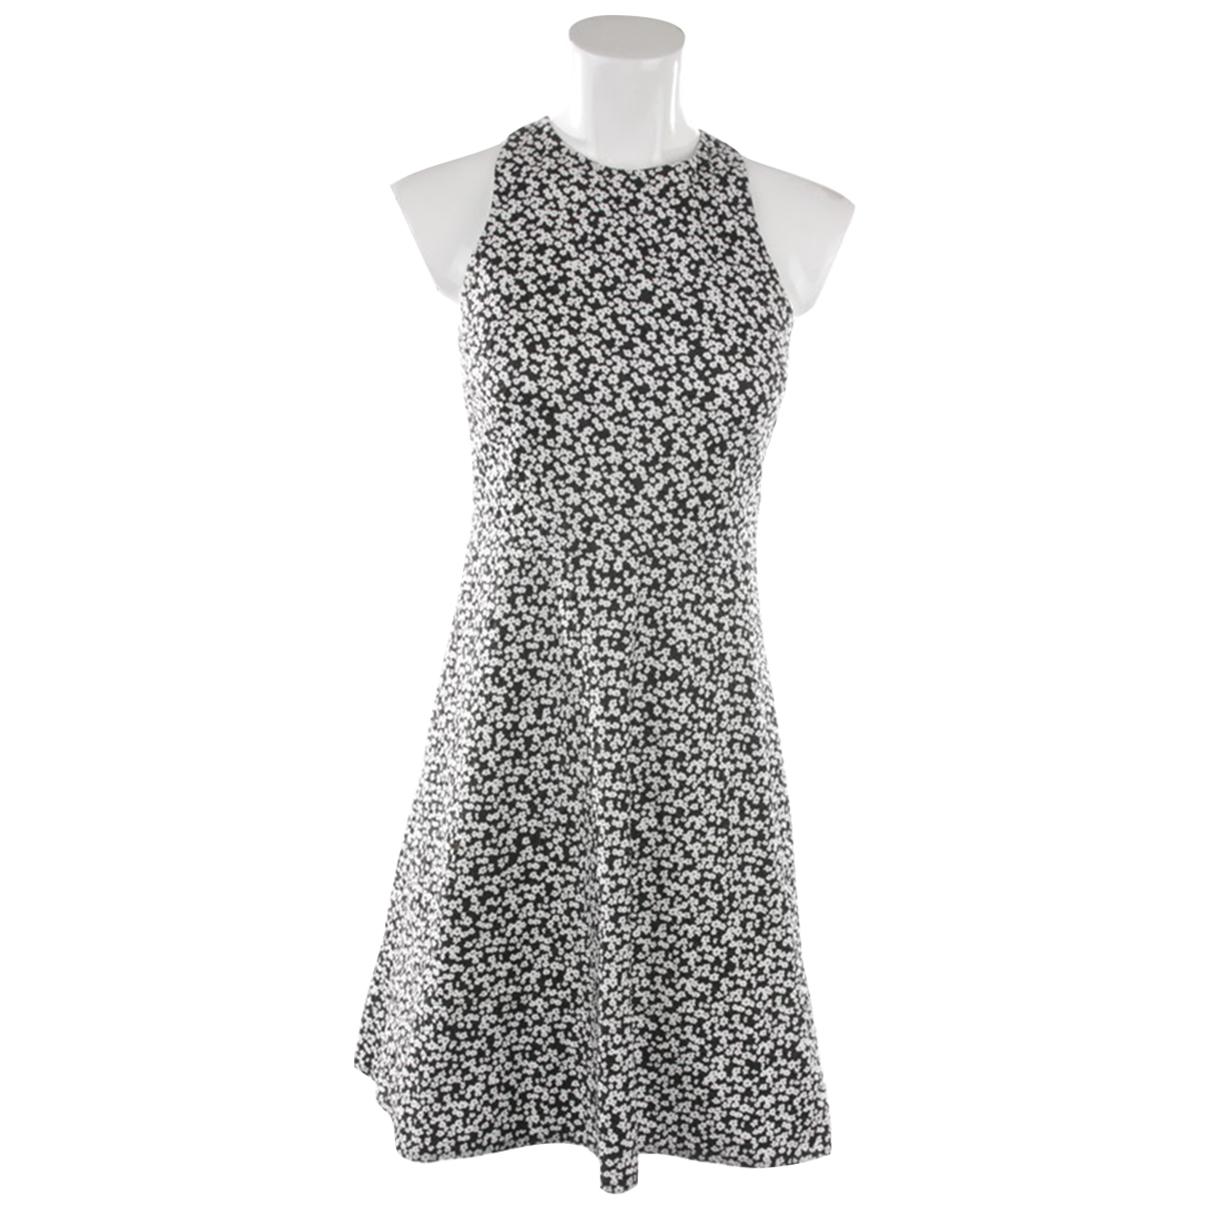 Dorothee Schumacher N Black Cotton dress for Women 34 FR